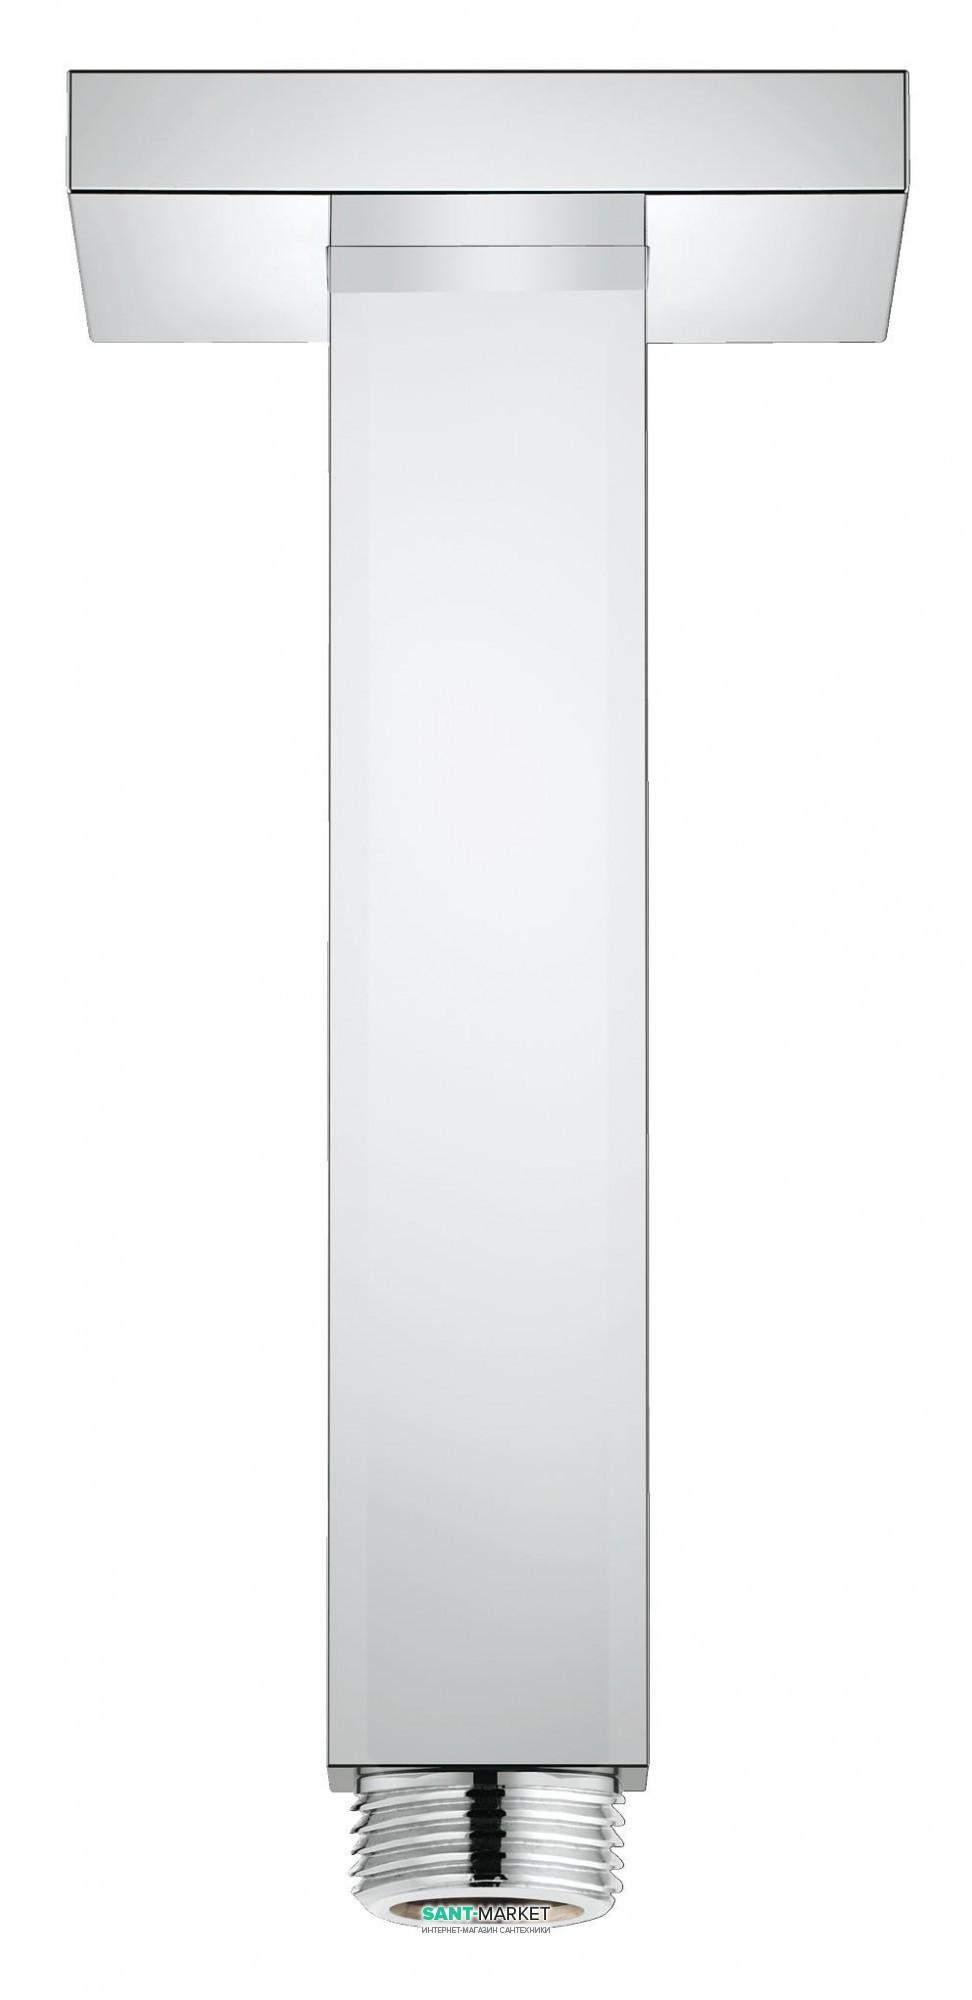 Потолочный душевой кронштейн Grohe Rainshower neutral 15.4 хром 27711000